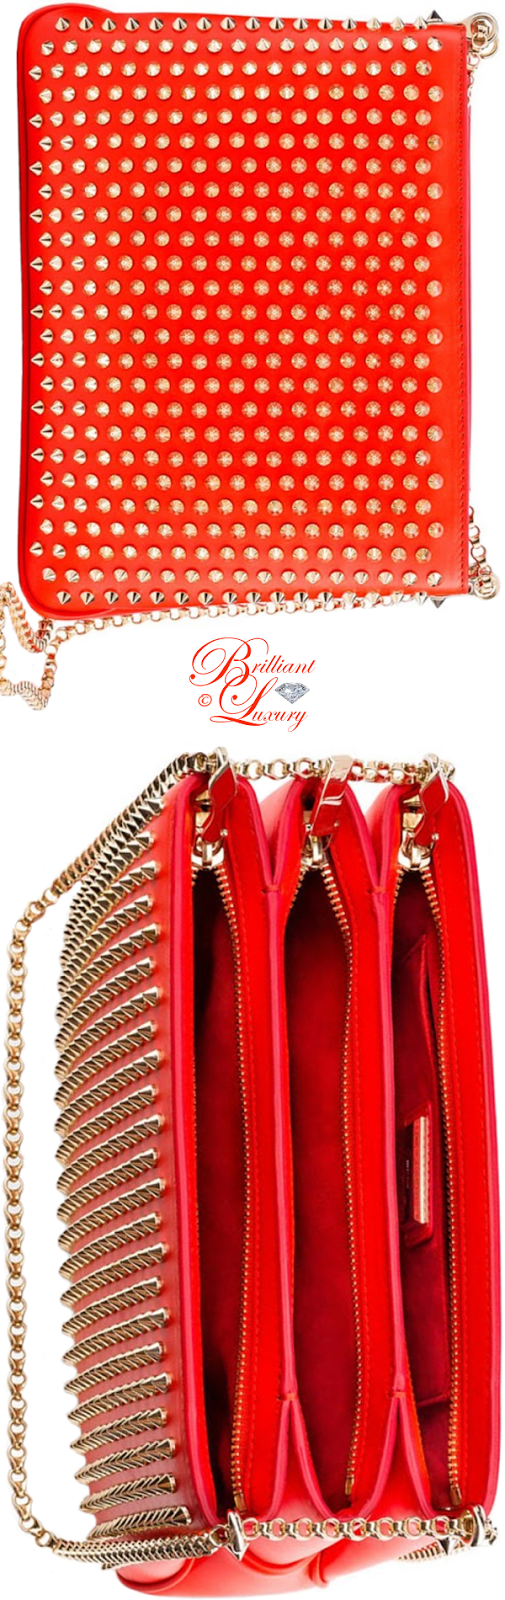 Brilliant Luxury ♦ Christian Louboutin Triloubi chain bag